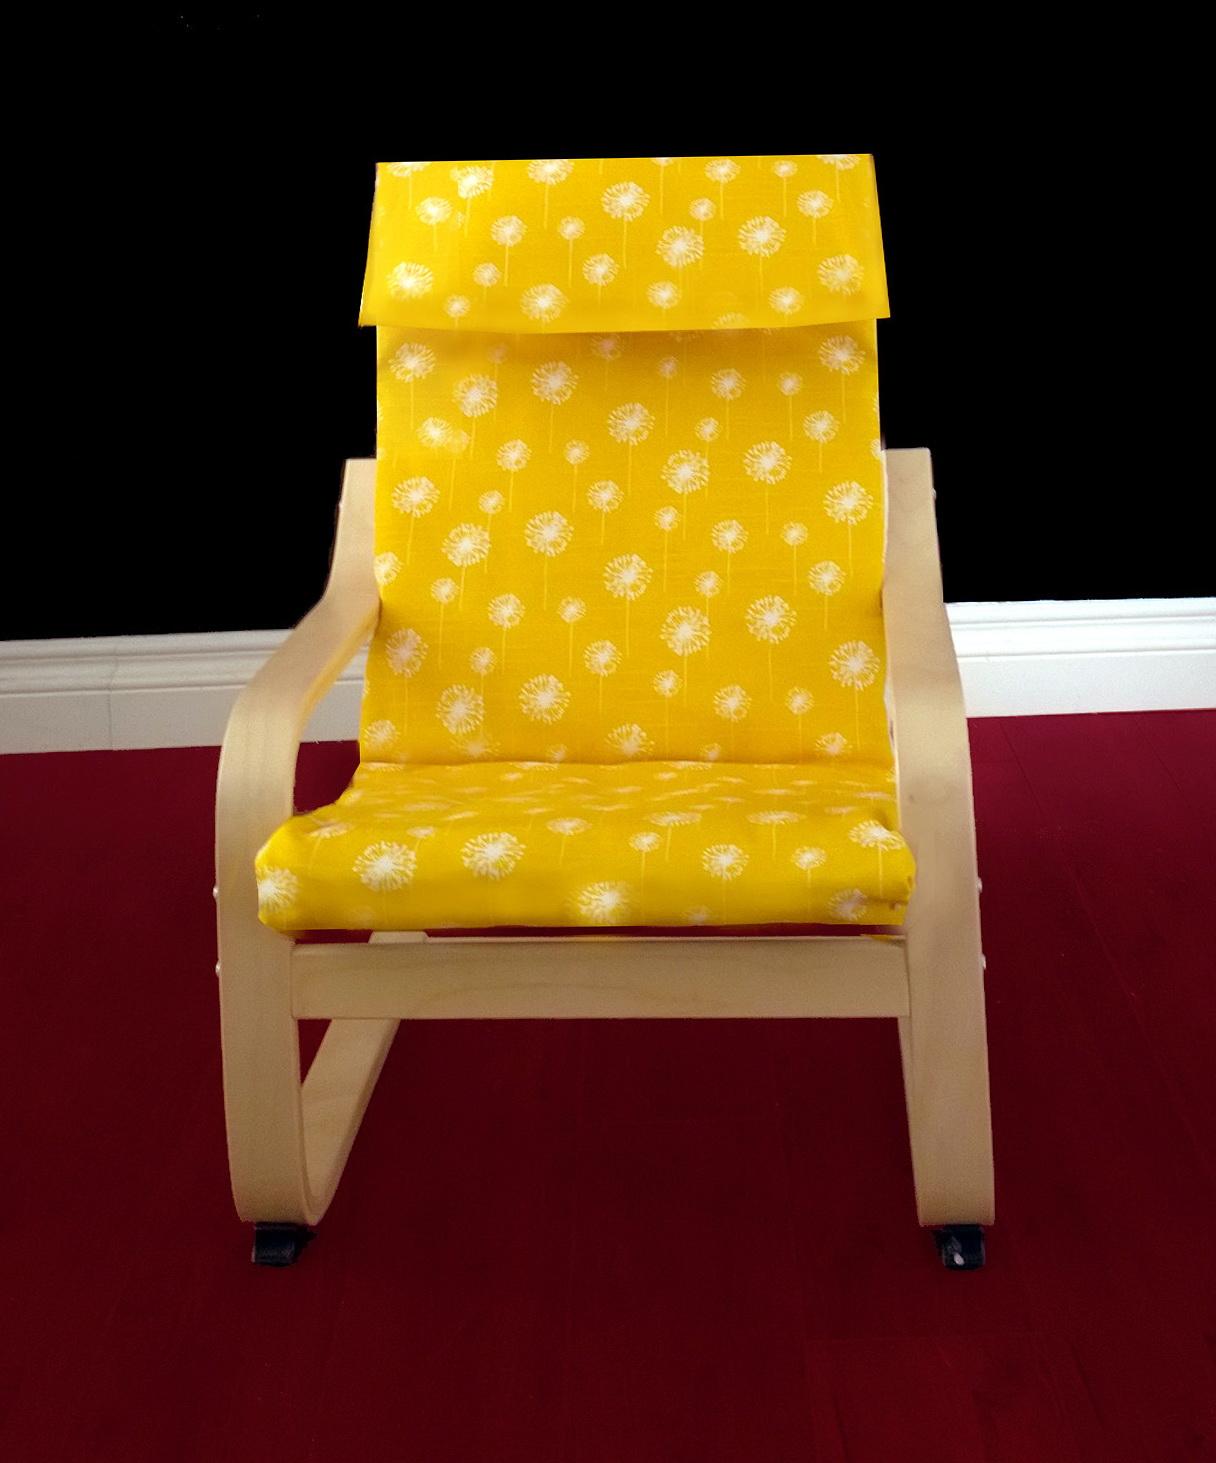 ikea poang chair covers uk high target cushion diy home design ideas